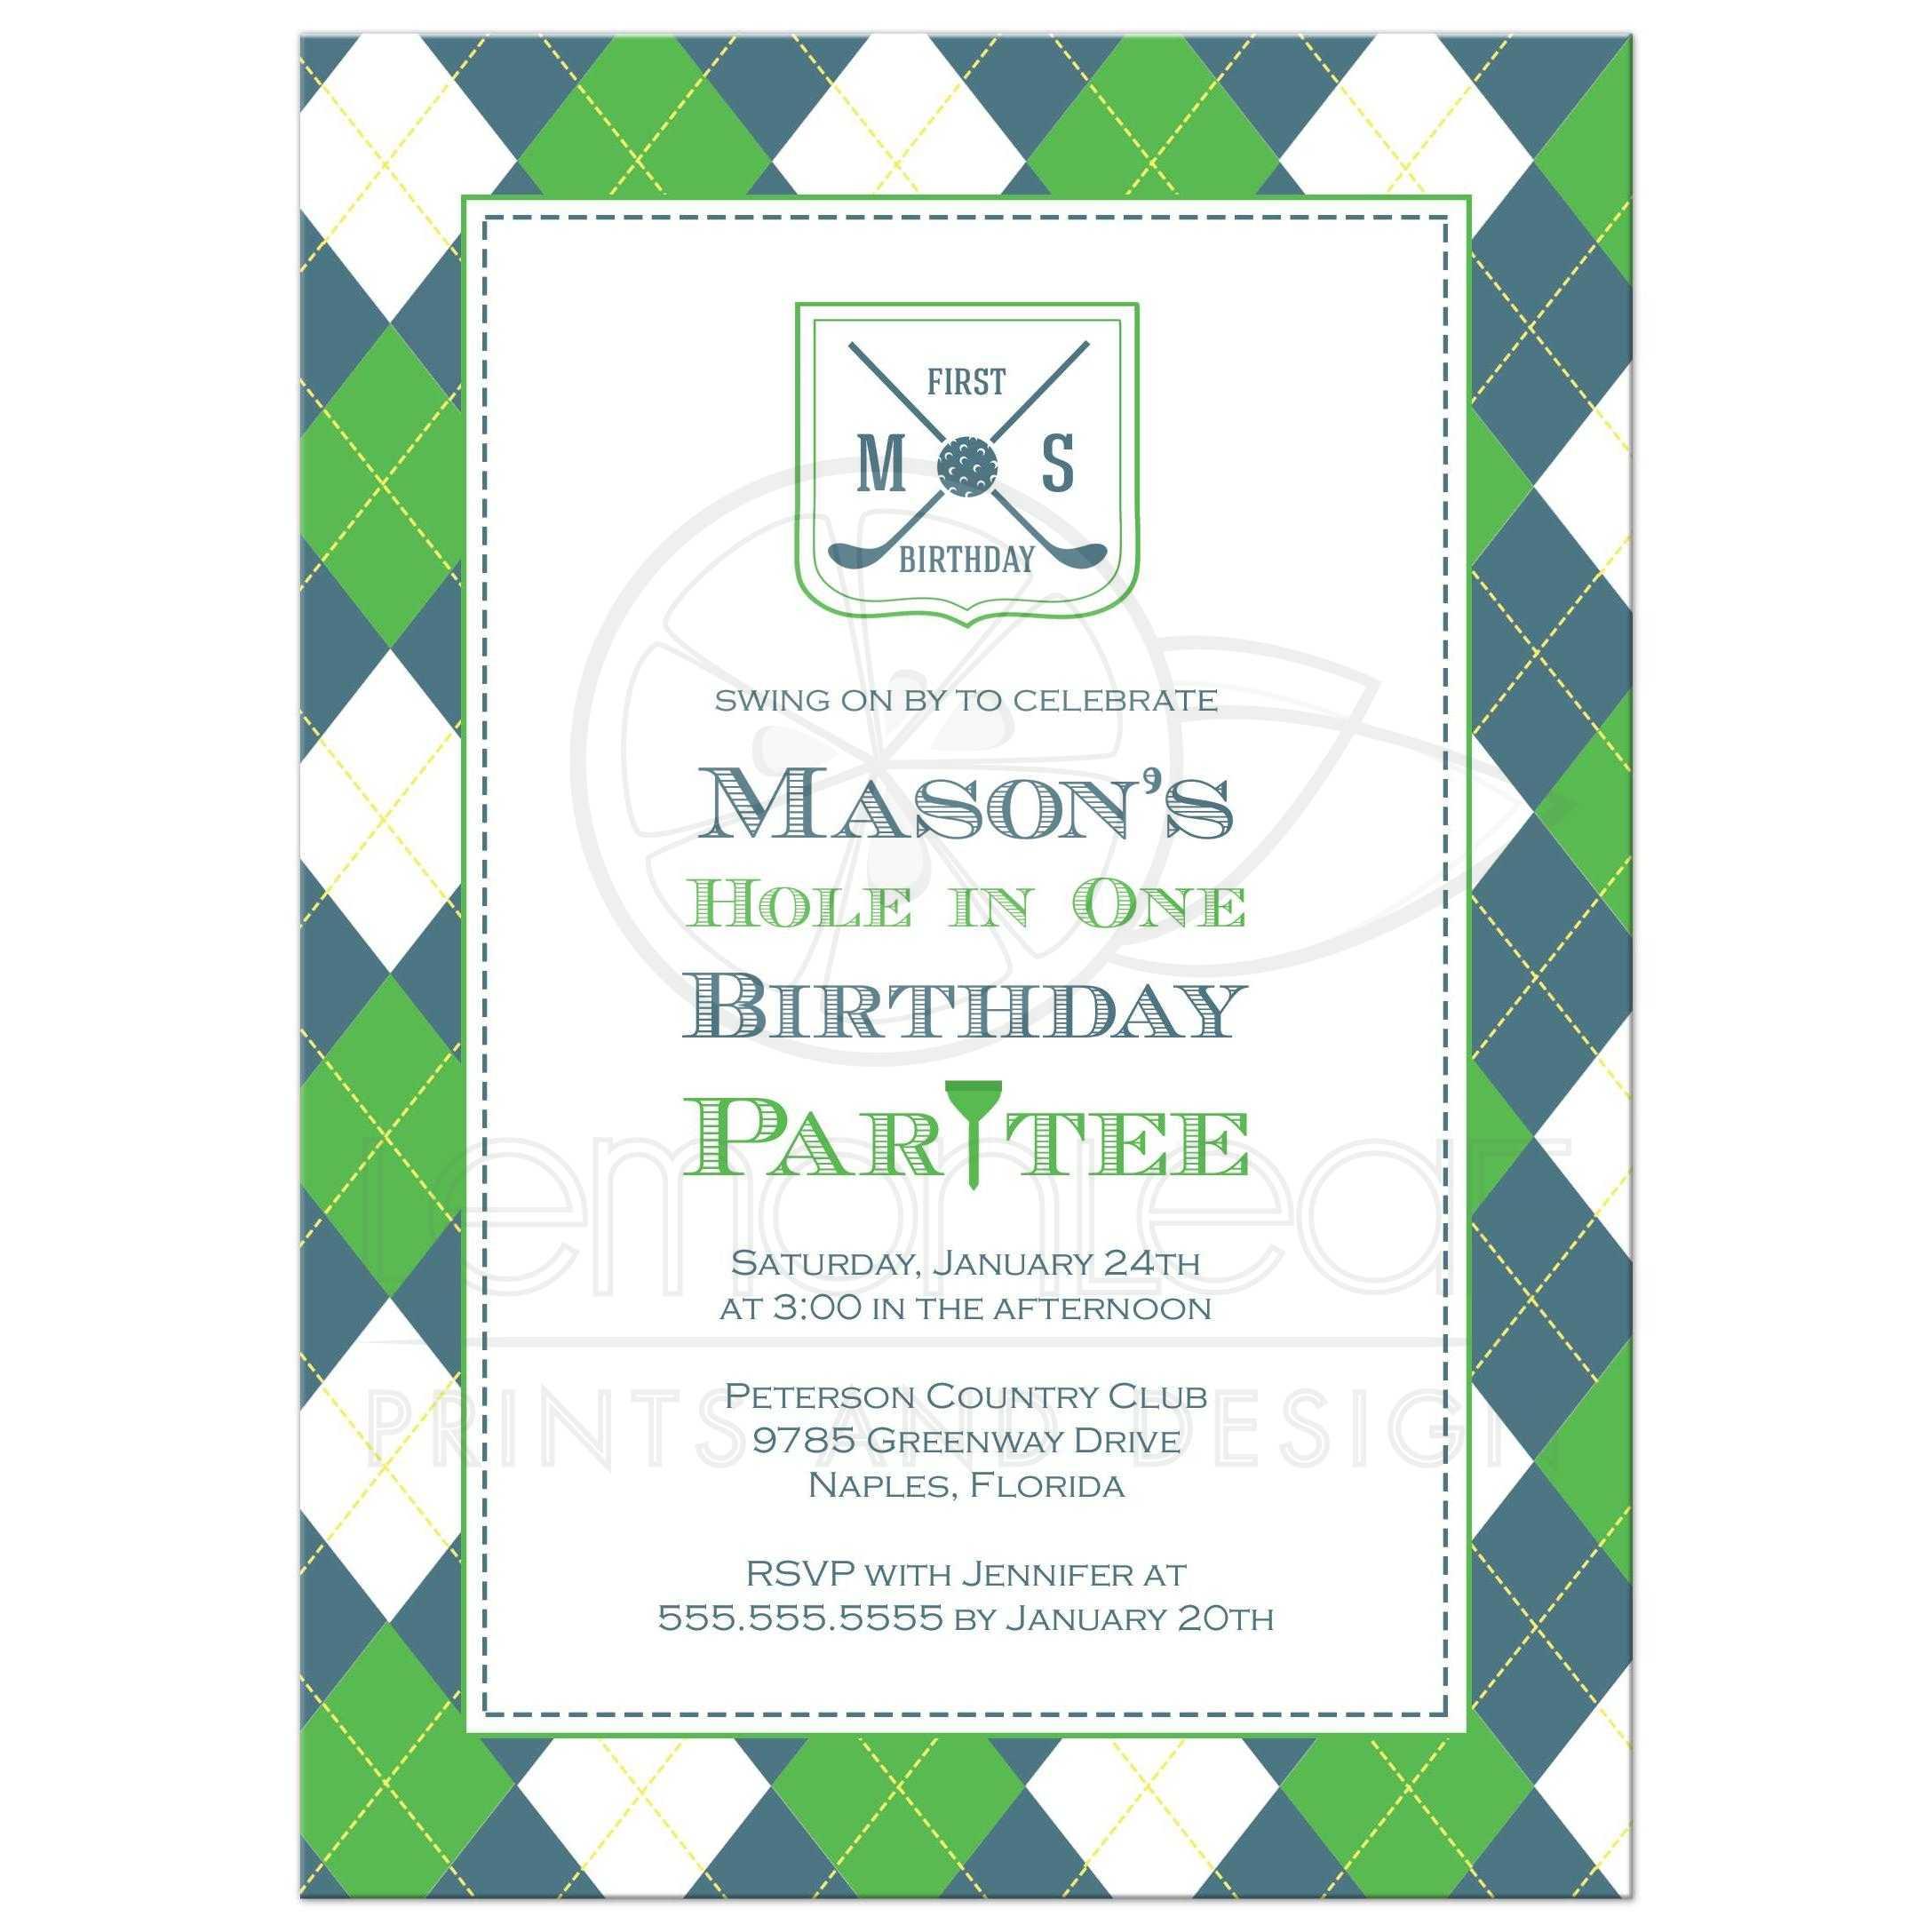 Birthday Party Invitation Blue And Green Argyle Golf